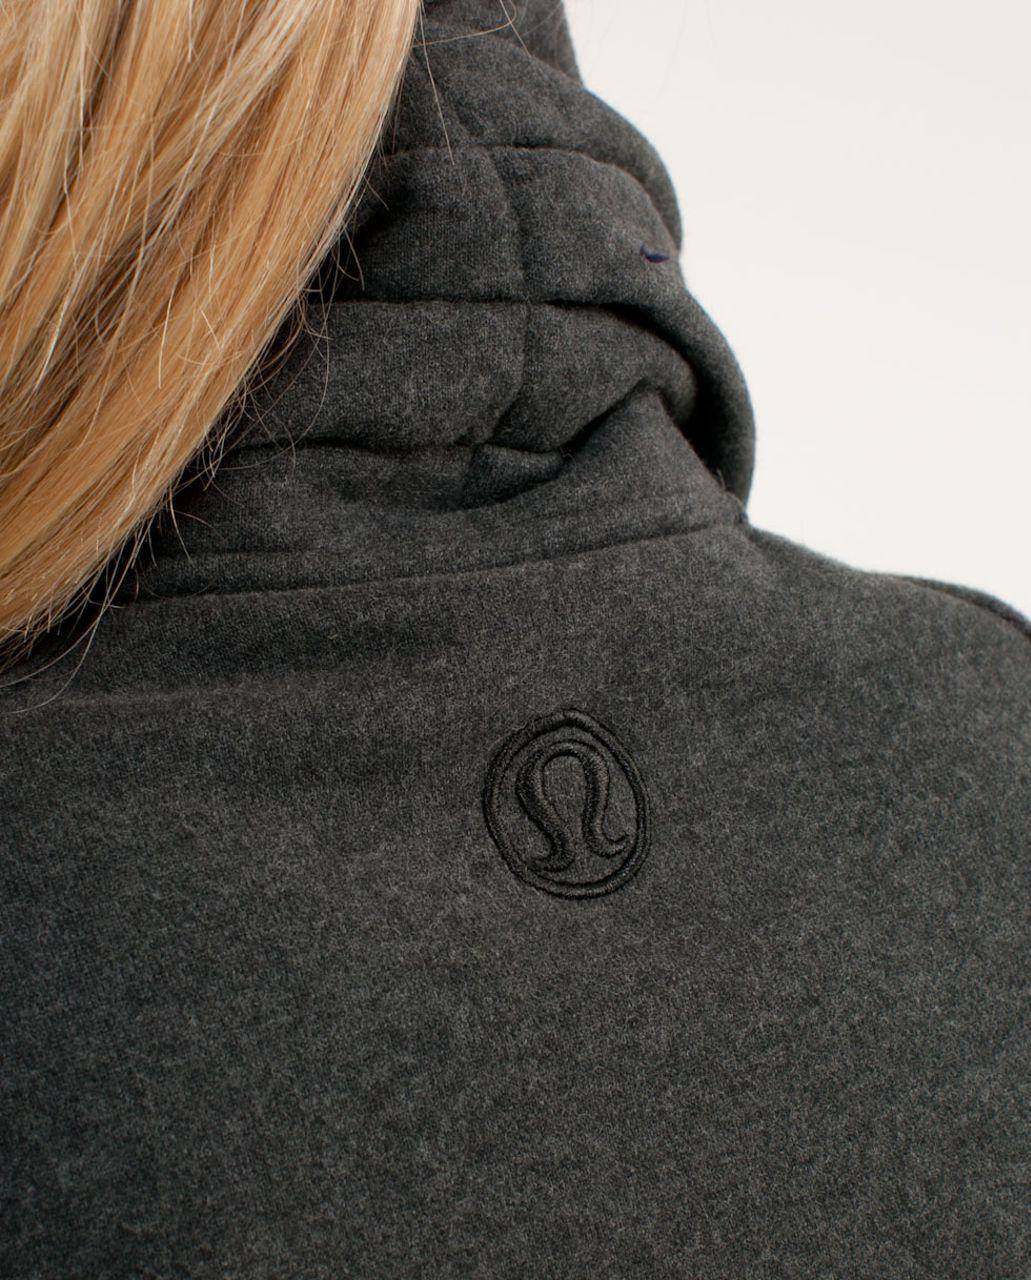 Lululemon Cuddle Up Jacket - Heathered Deep Coal